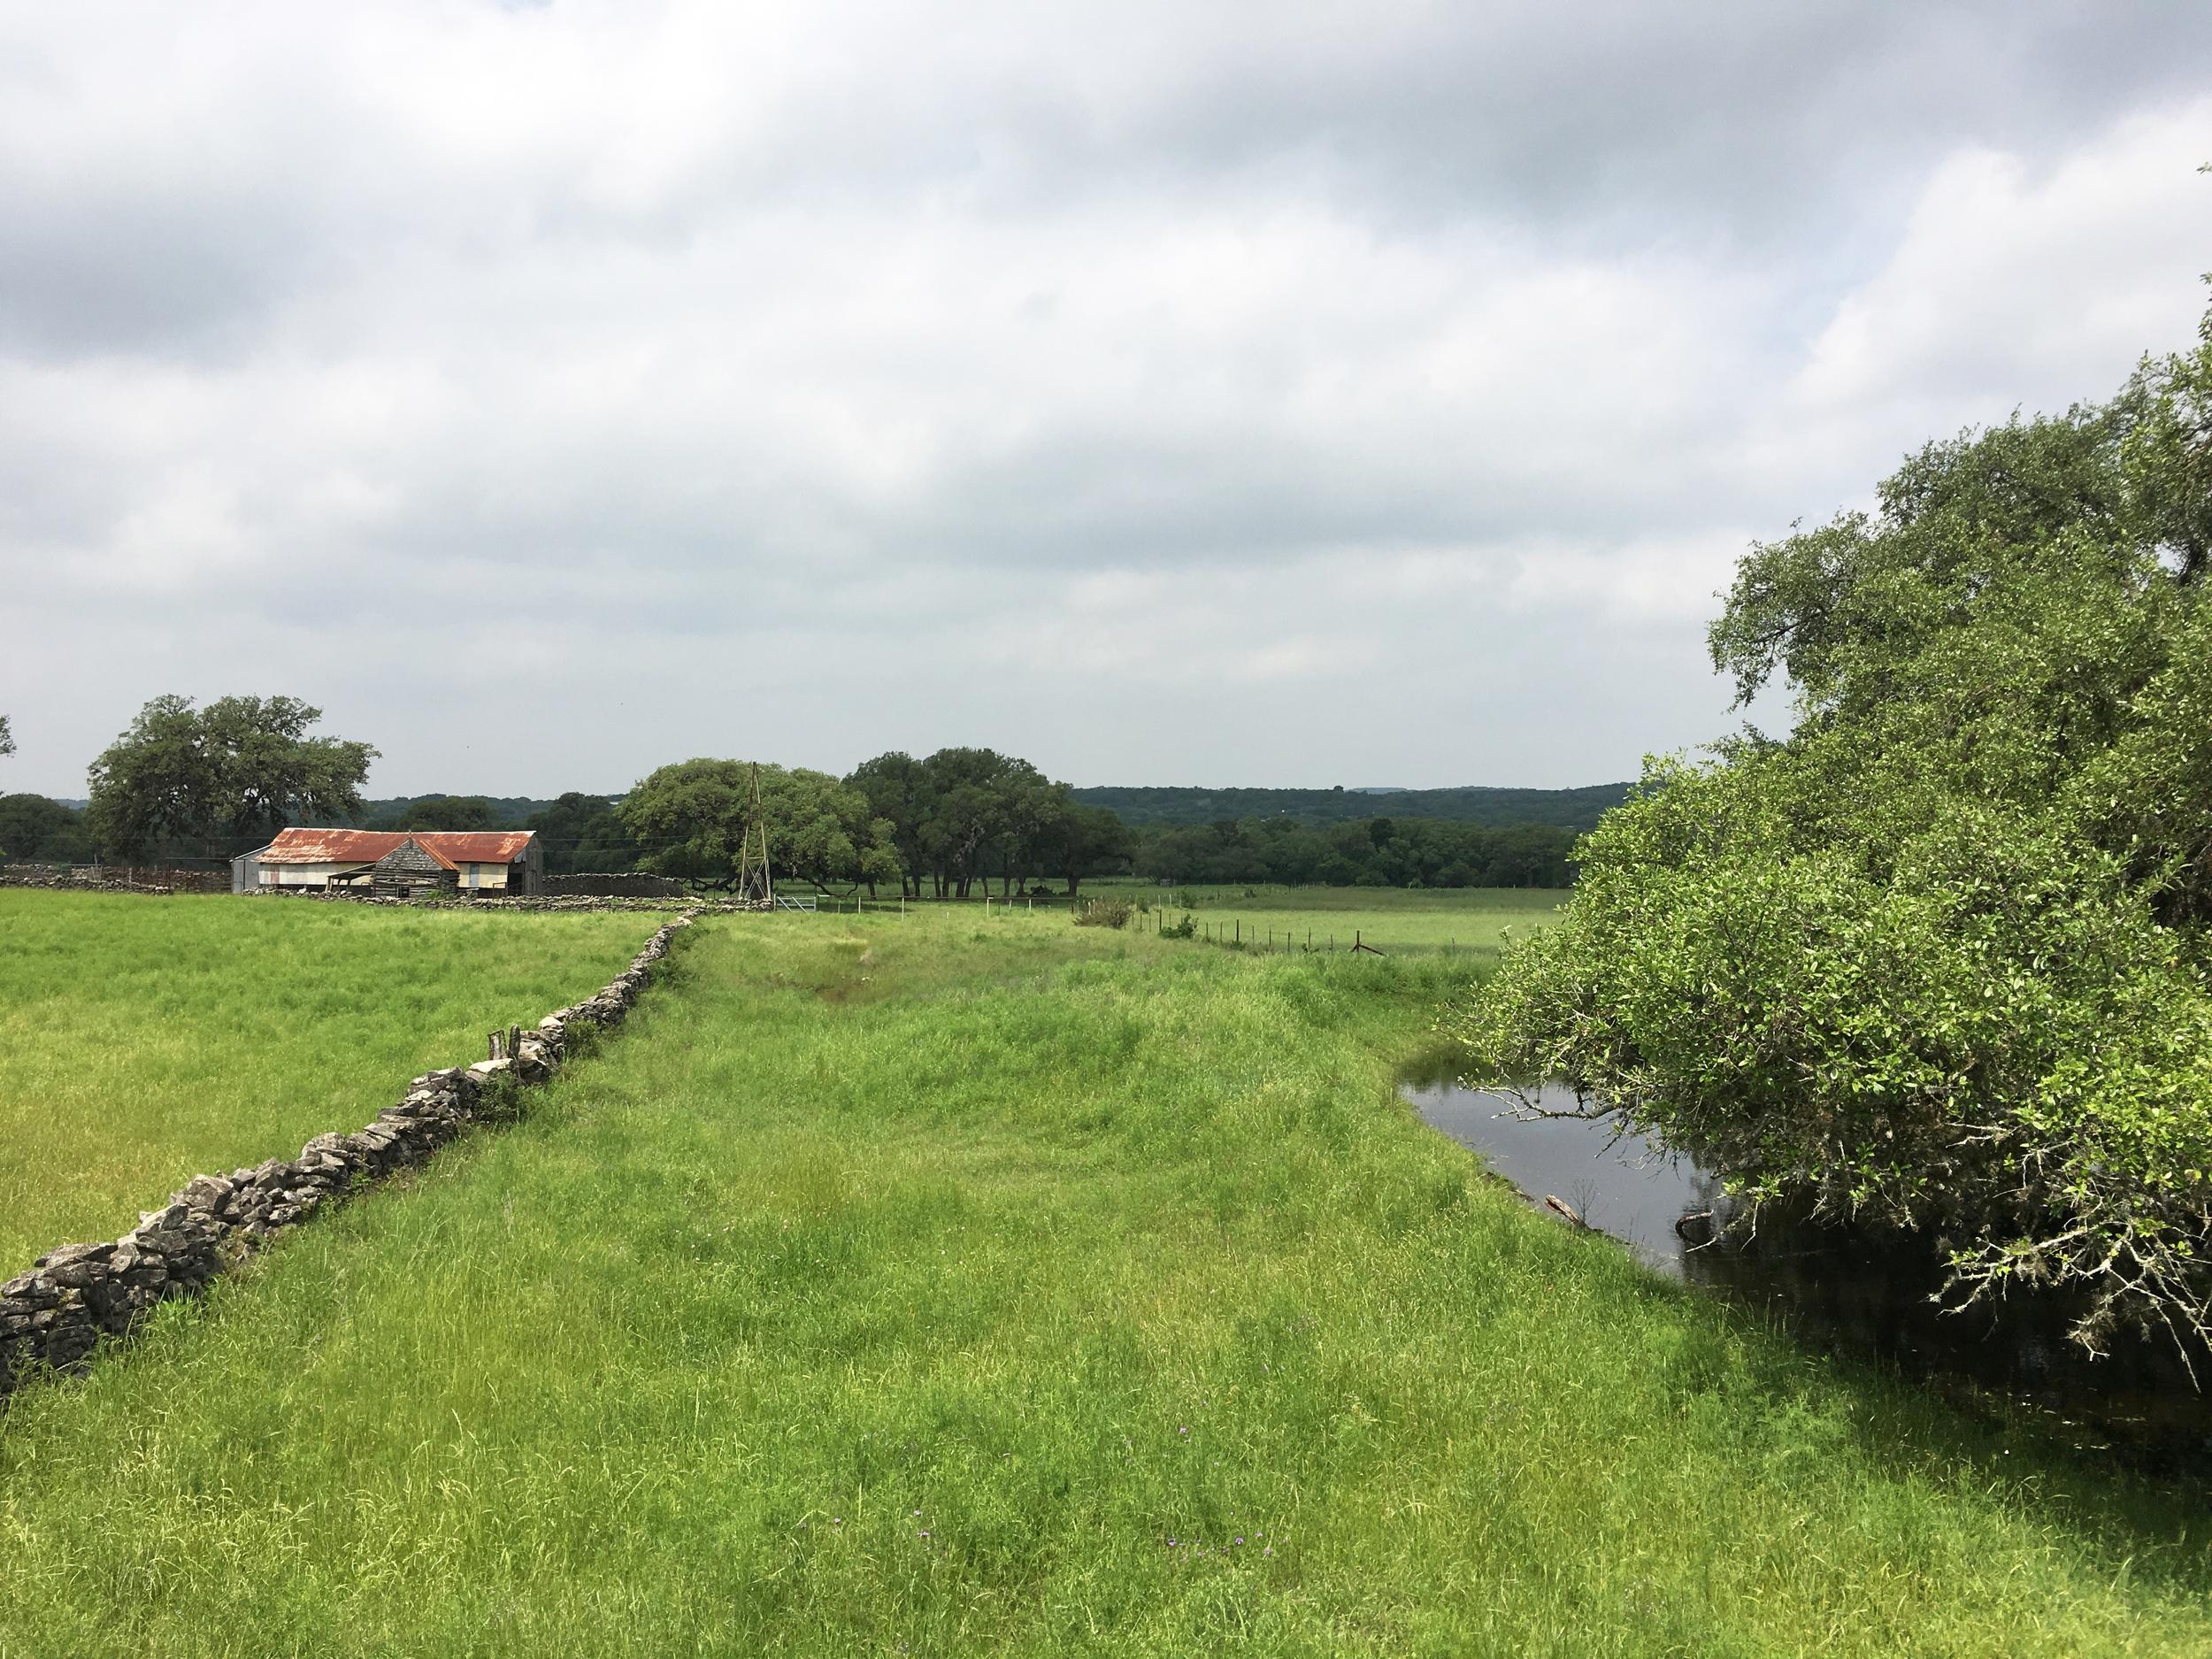 orchard-fence-2.jpg